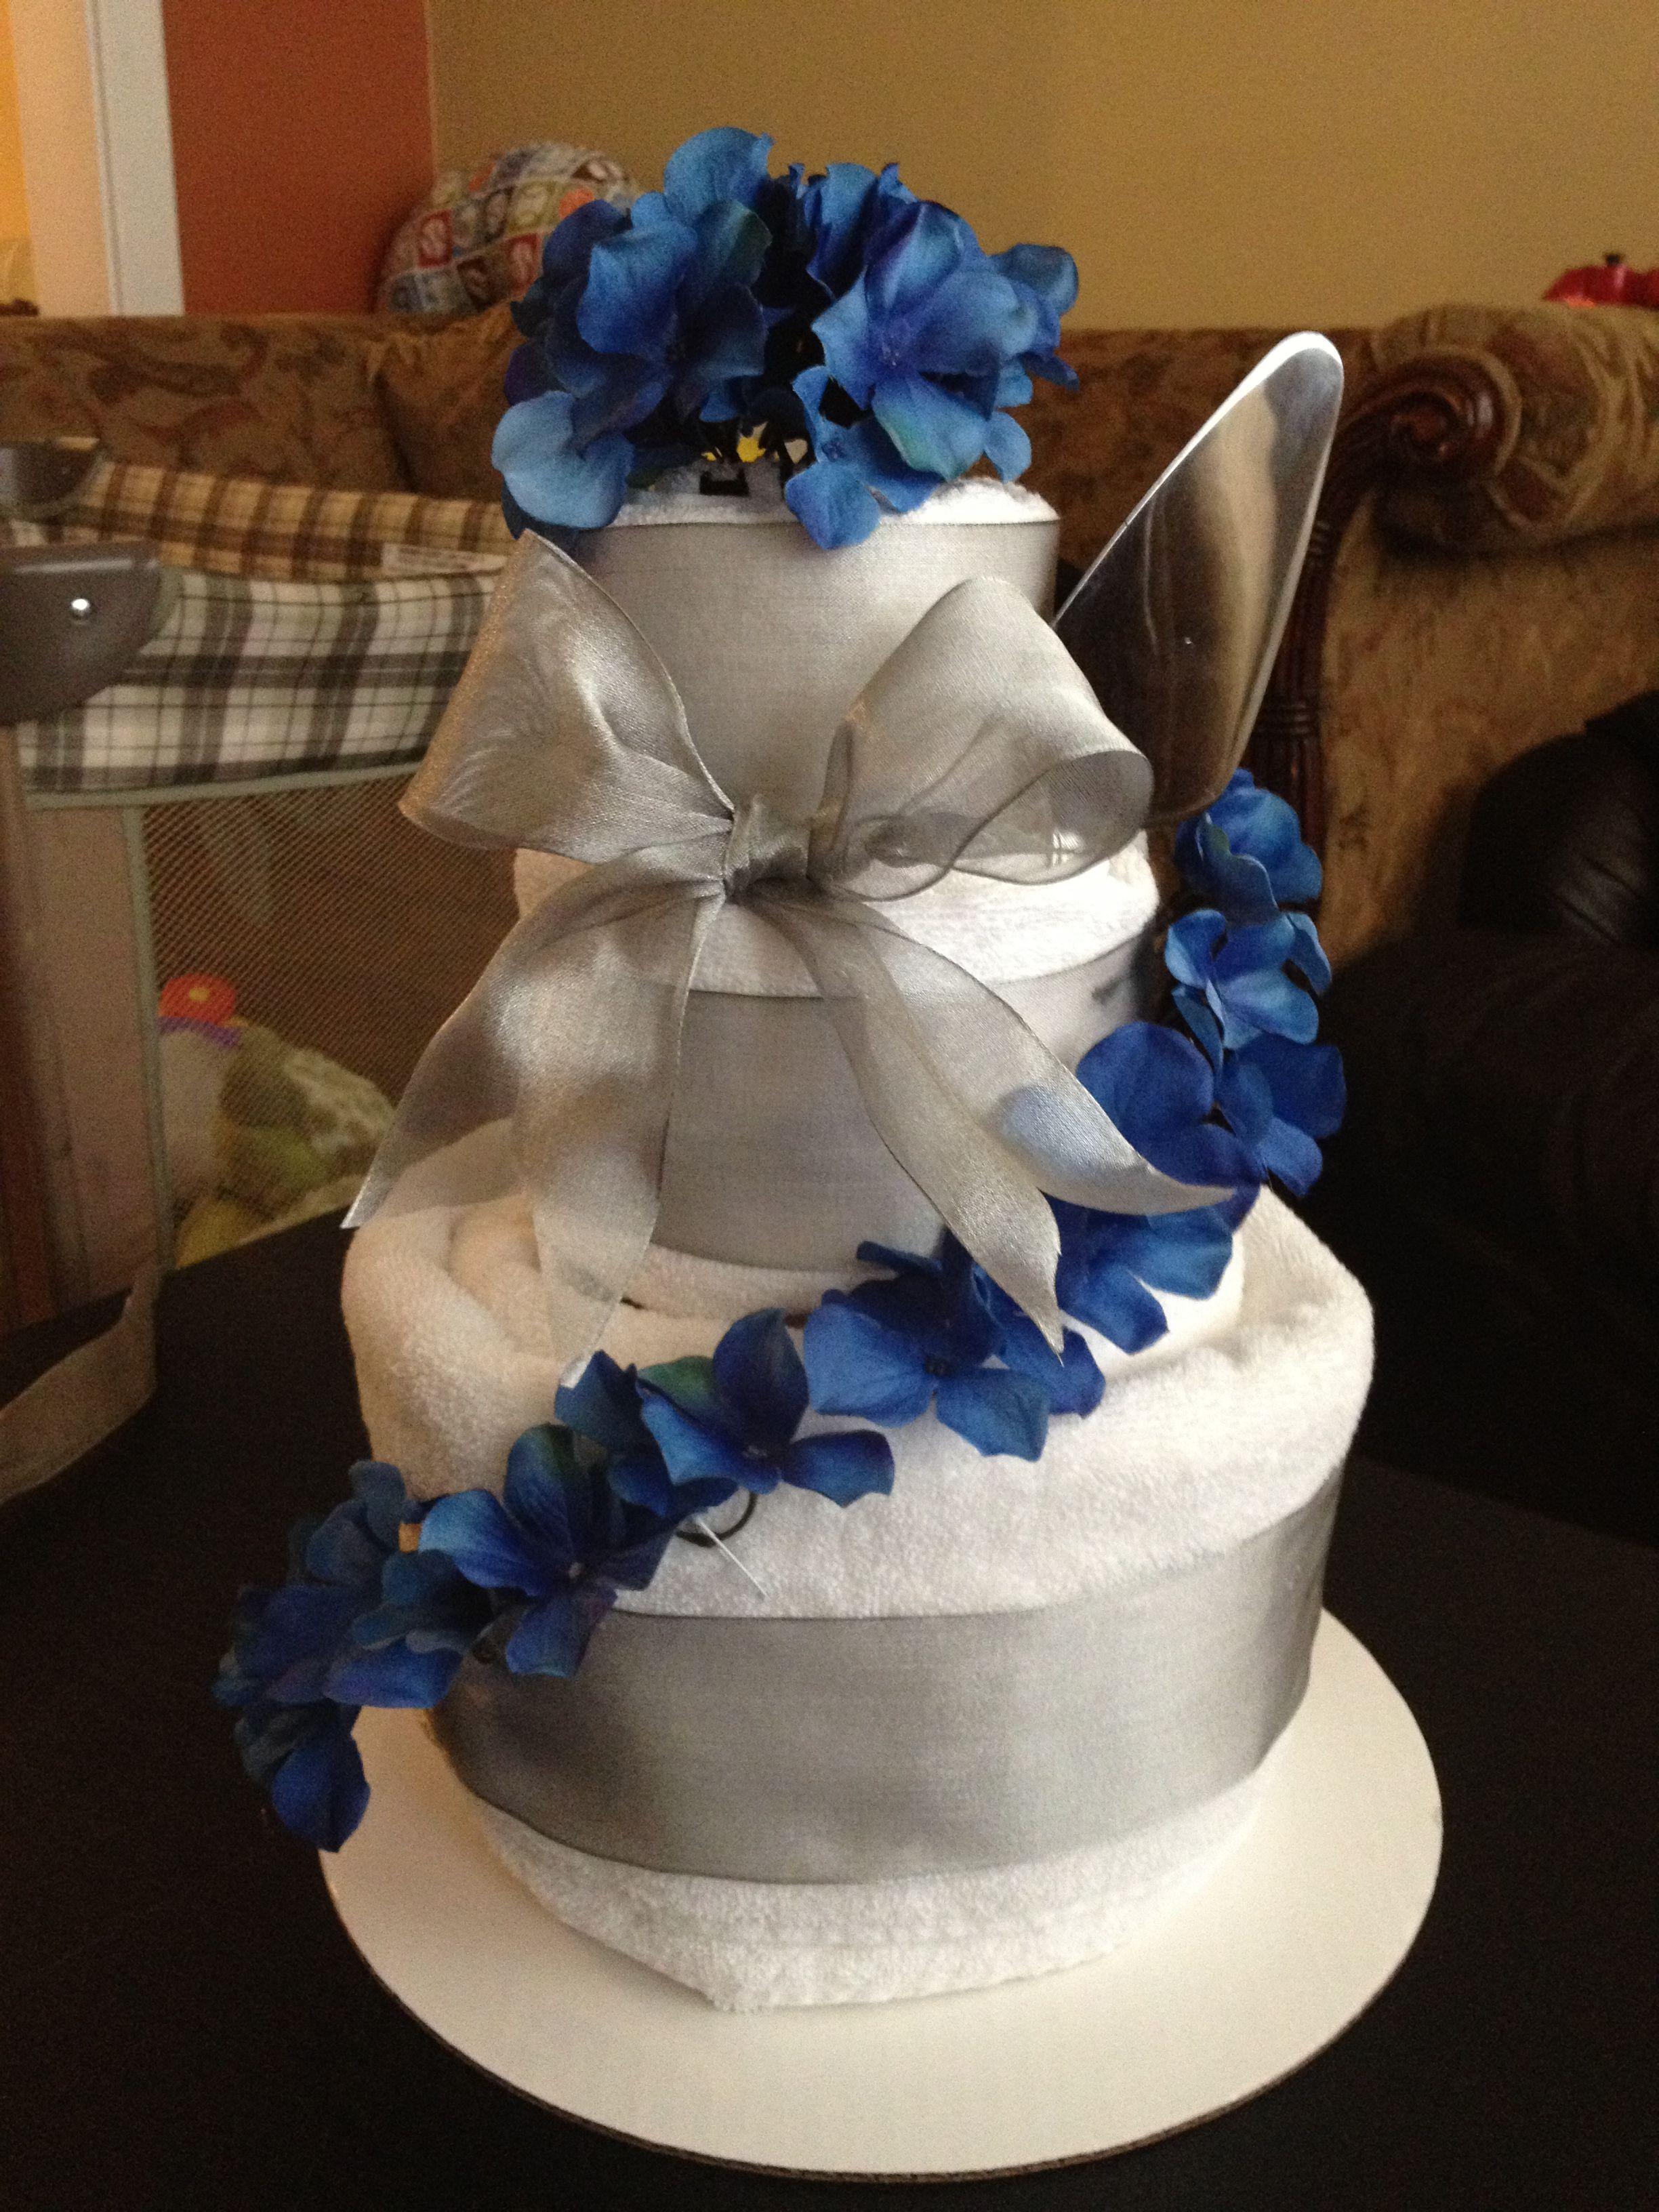 Wedding shower towel cake.:) it's quite simple.